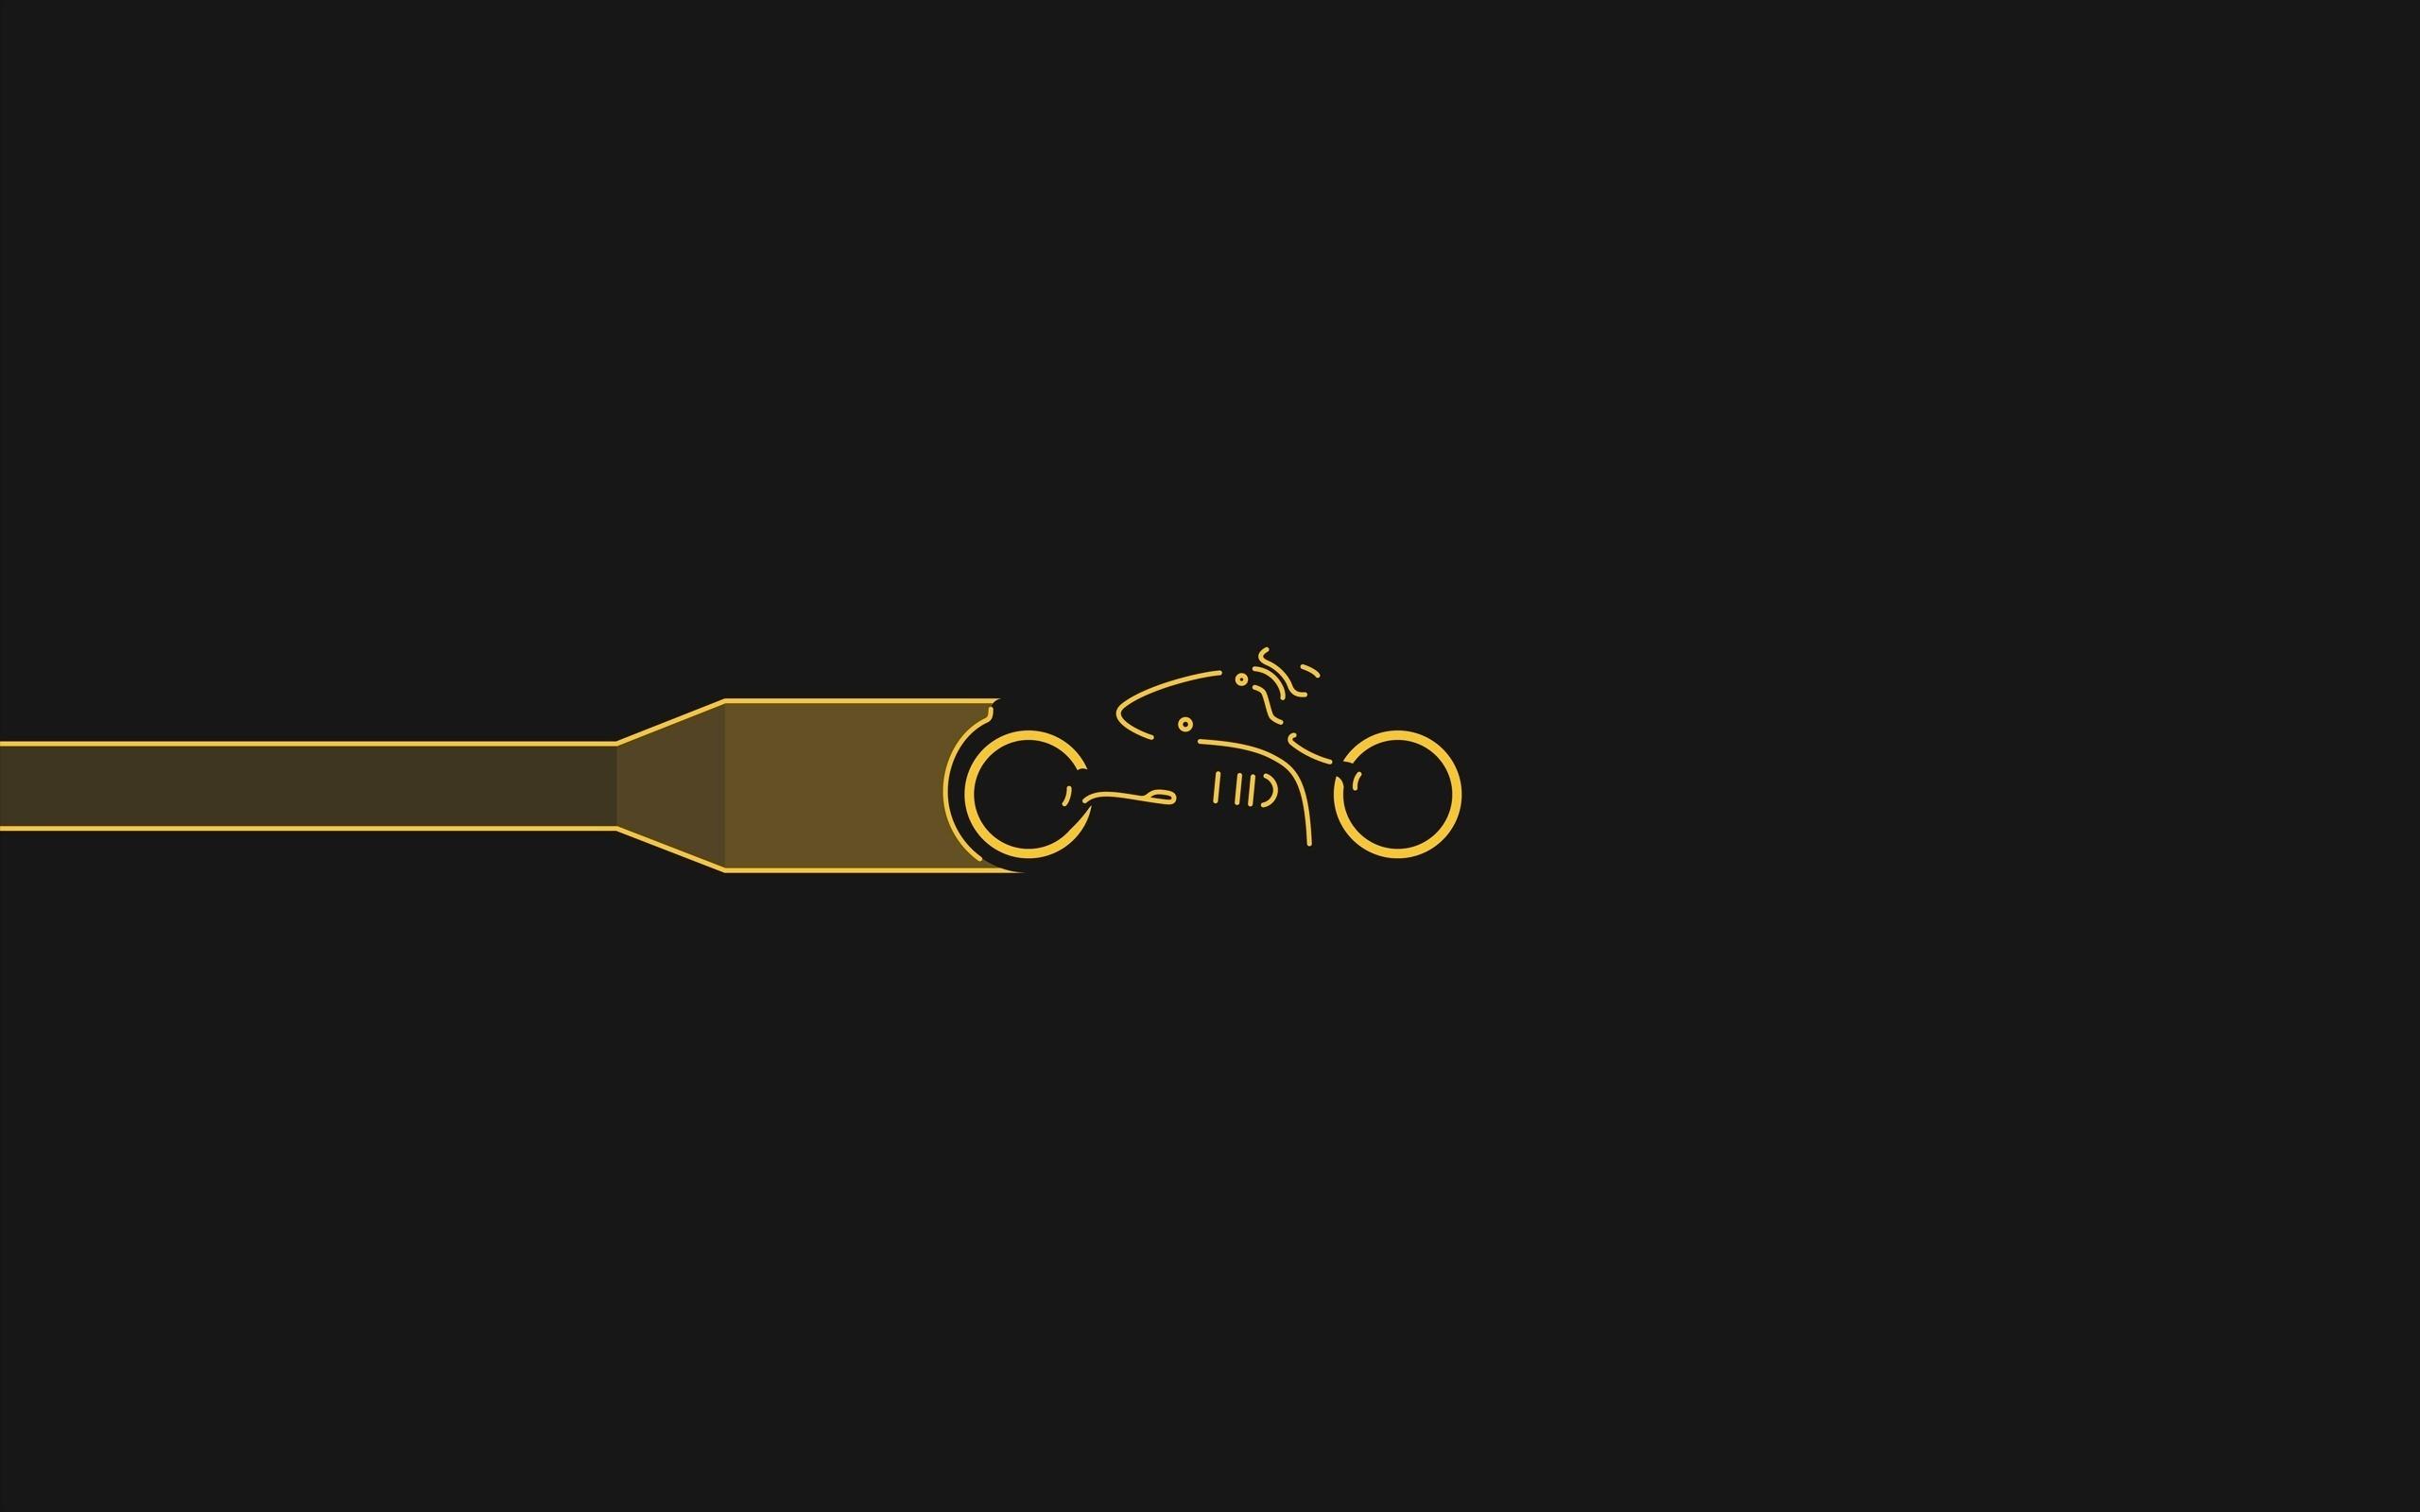 Must see Wallpaper Horse Minimalist - tumblr_static_abstract-minimalist-tron-hd-wallpaper  Collection_604444.jpg